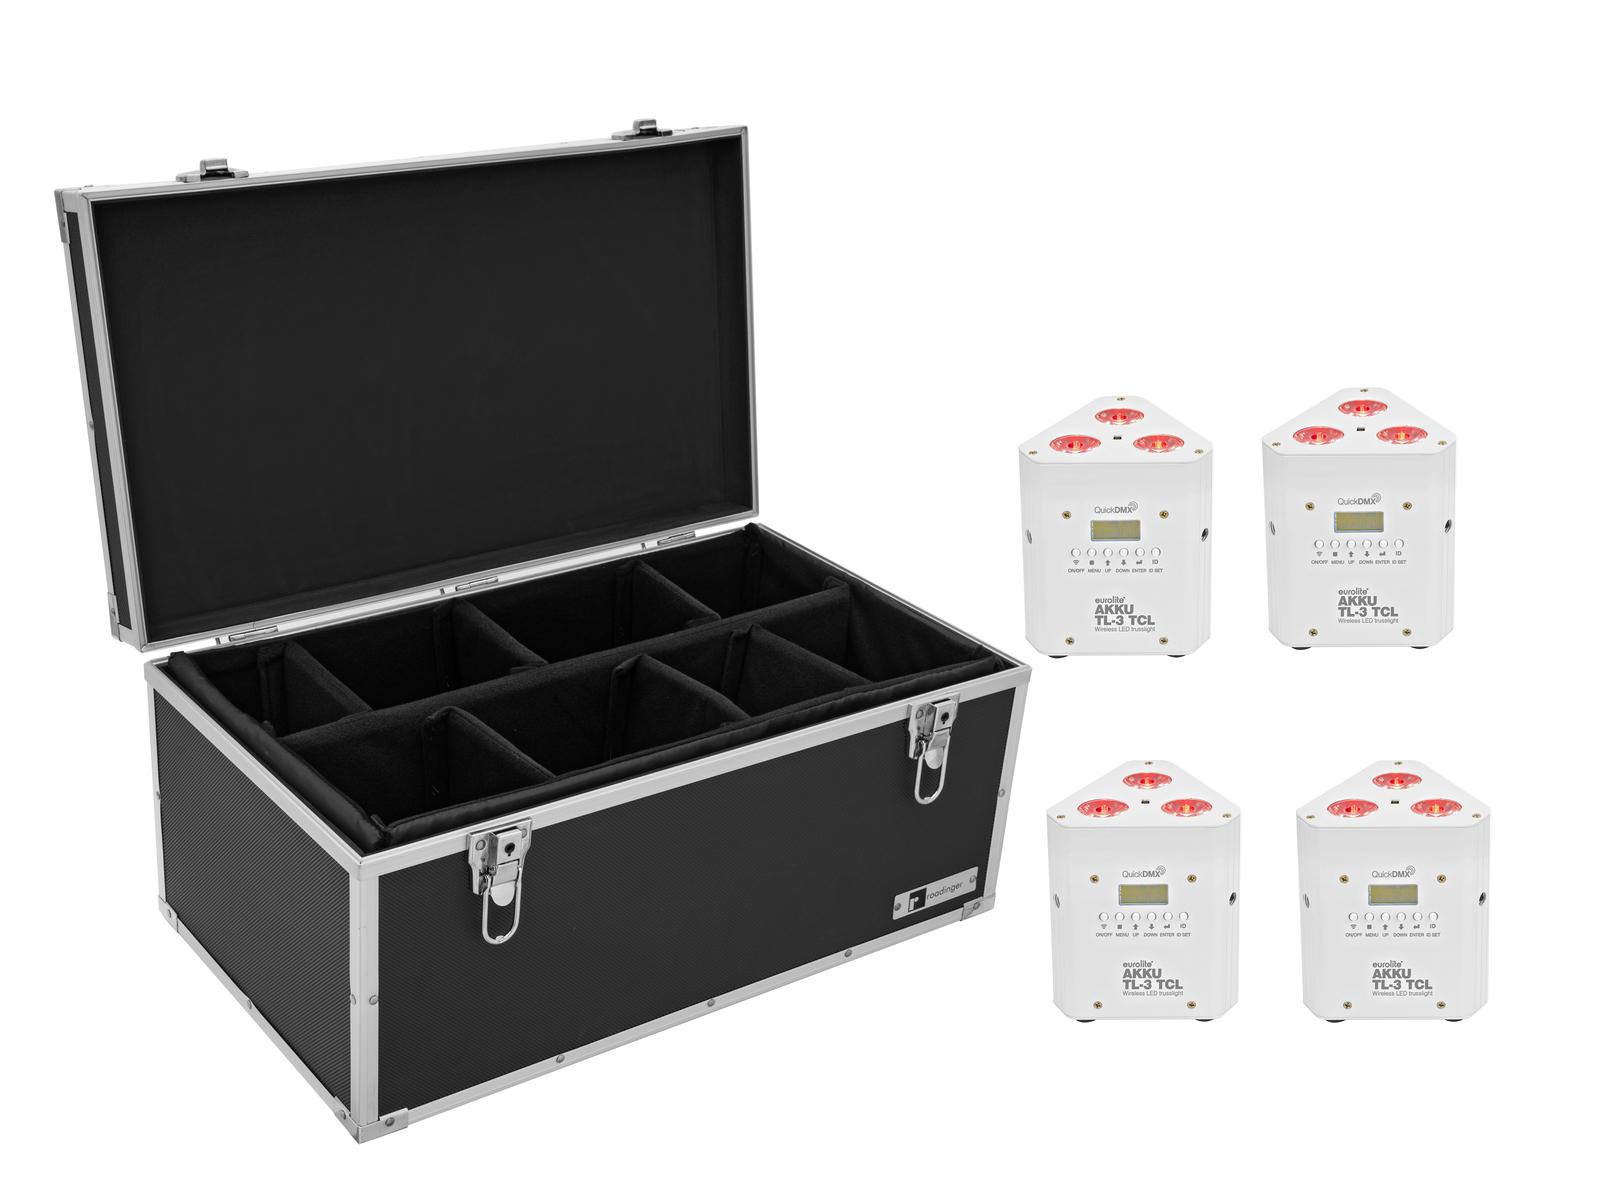 EUROLITE Set 4x AKKU TL-3 TCL weiß + Case TDV-1